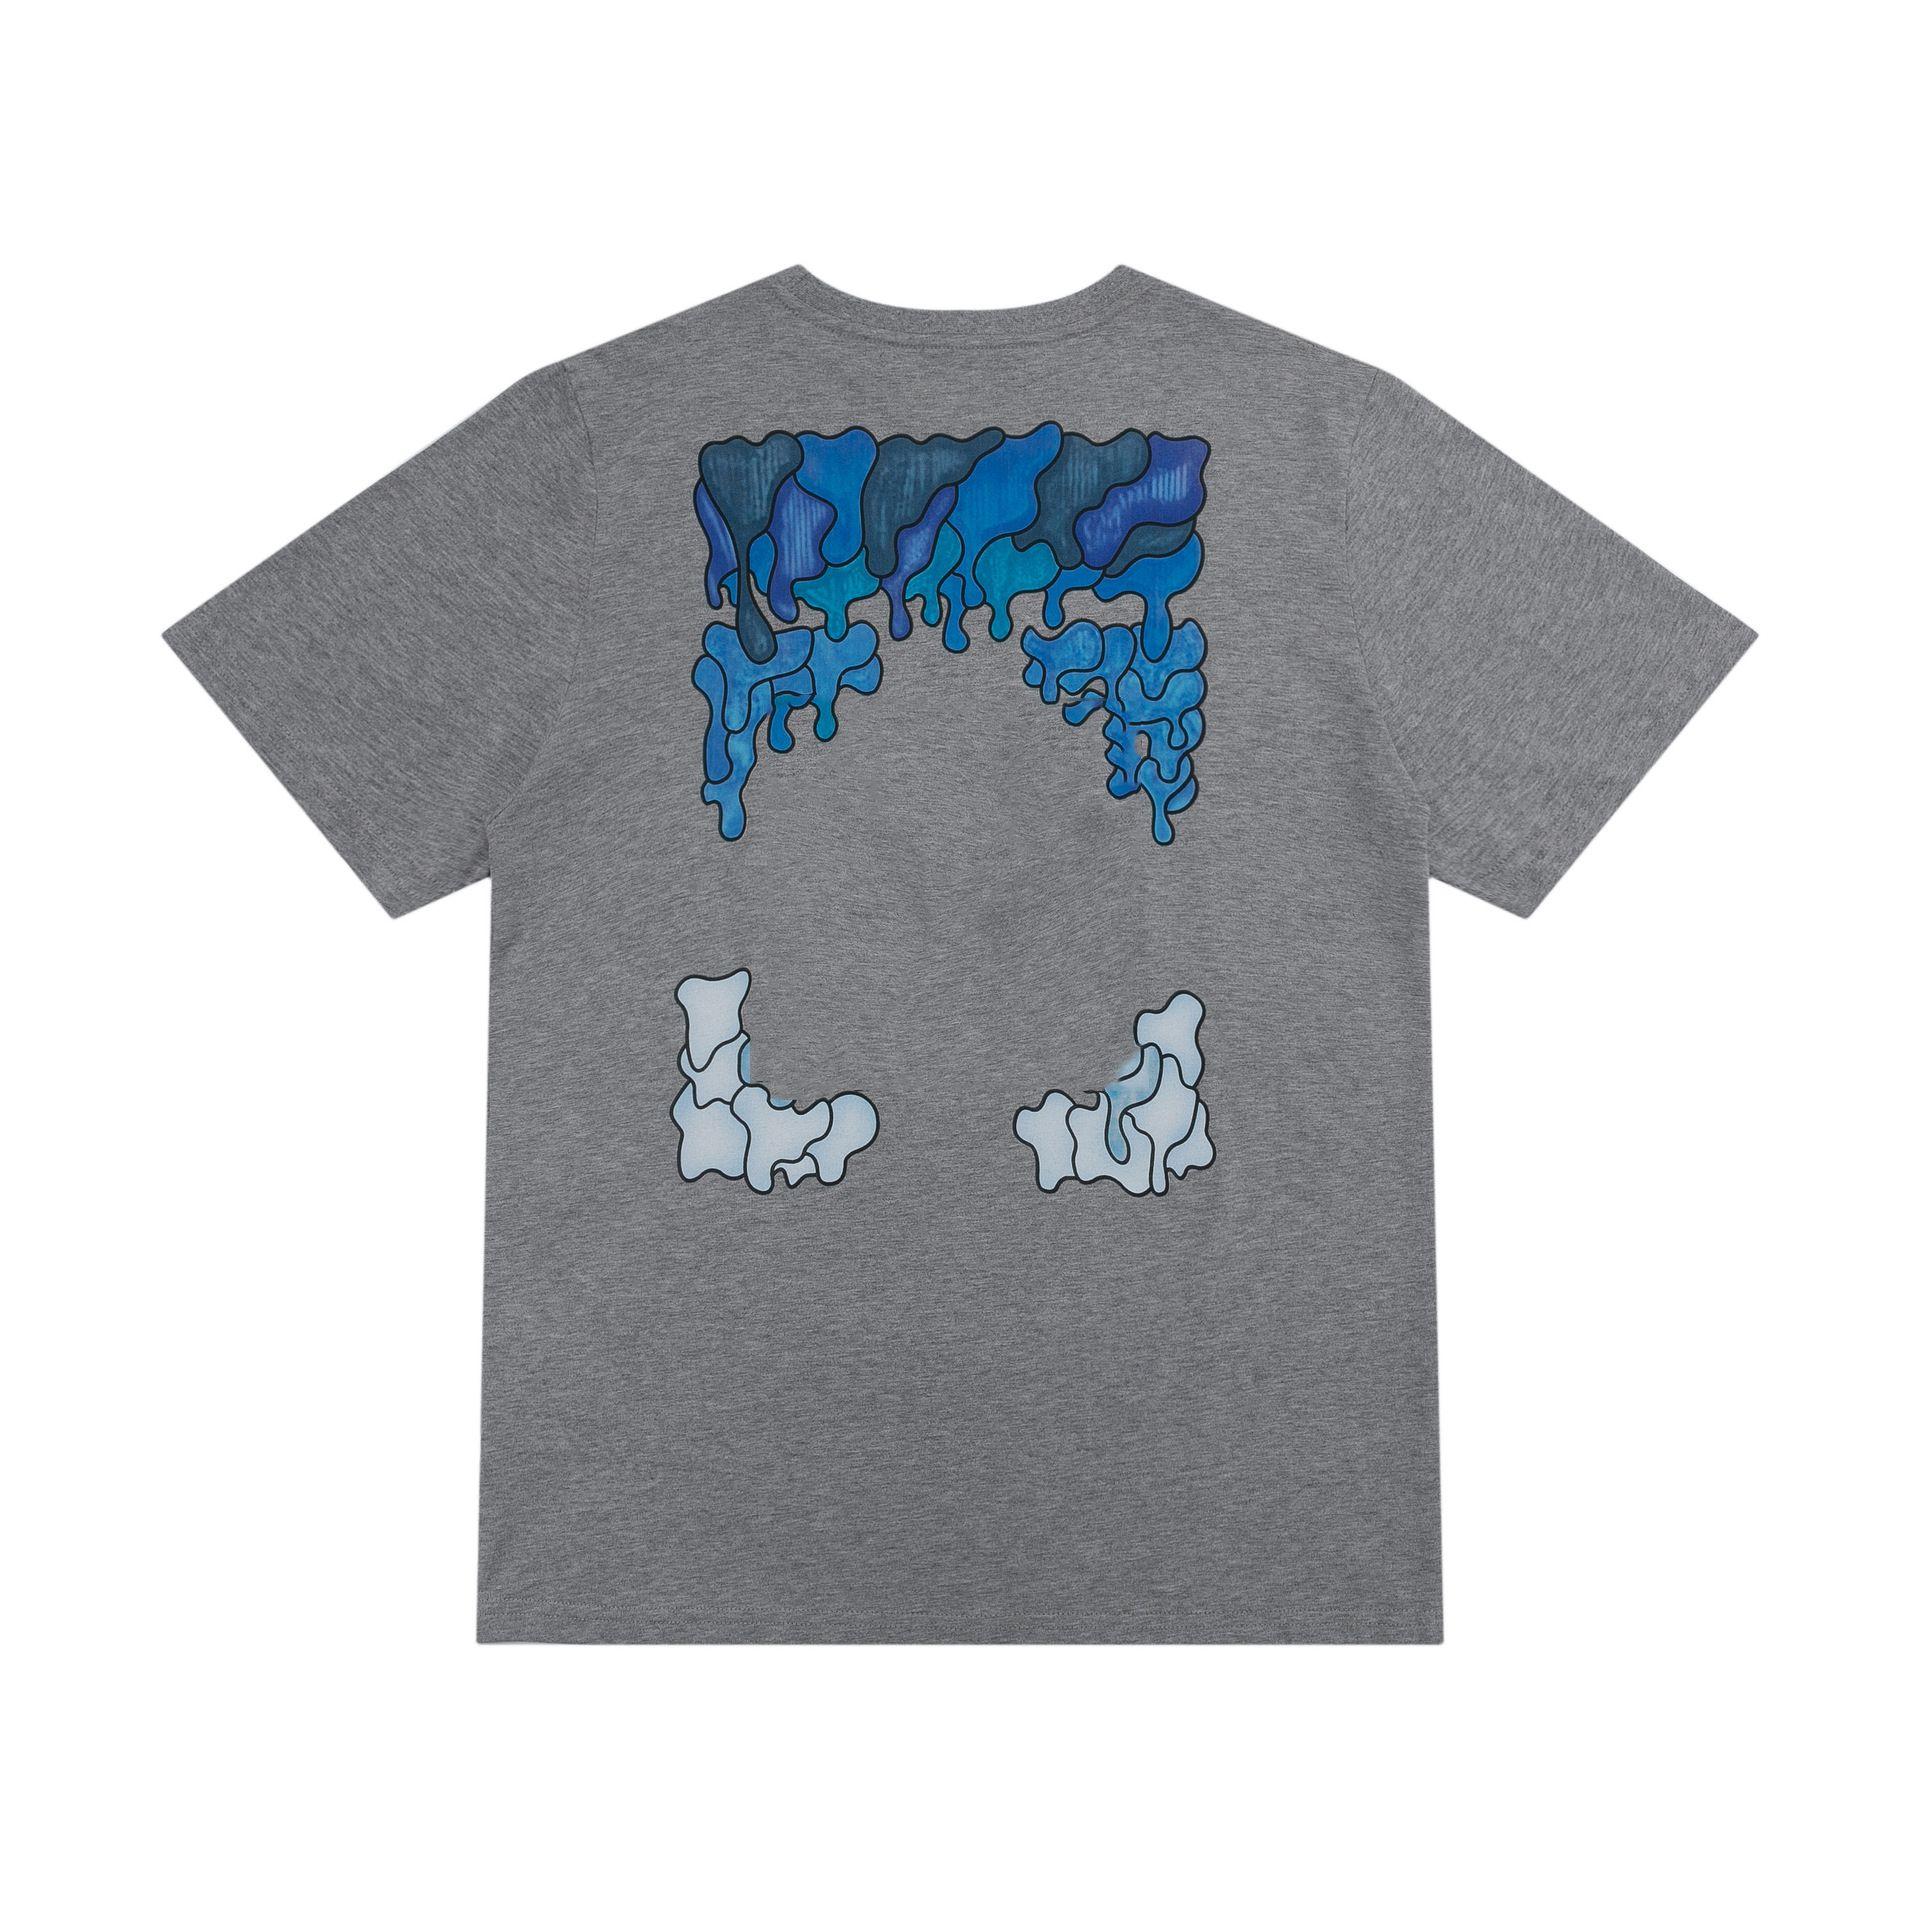 OFF 디자이너 크로스 패션 Dissolve 화살표 인쇄 반팔 T 셔츠 남성 탑 티 티셔츠 캐주얼 여성 티셔츠 X 인쇄 여름 탑스 EU 크기